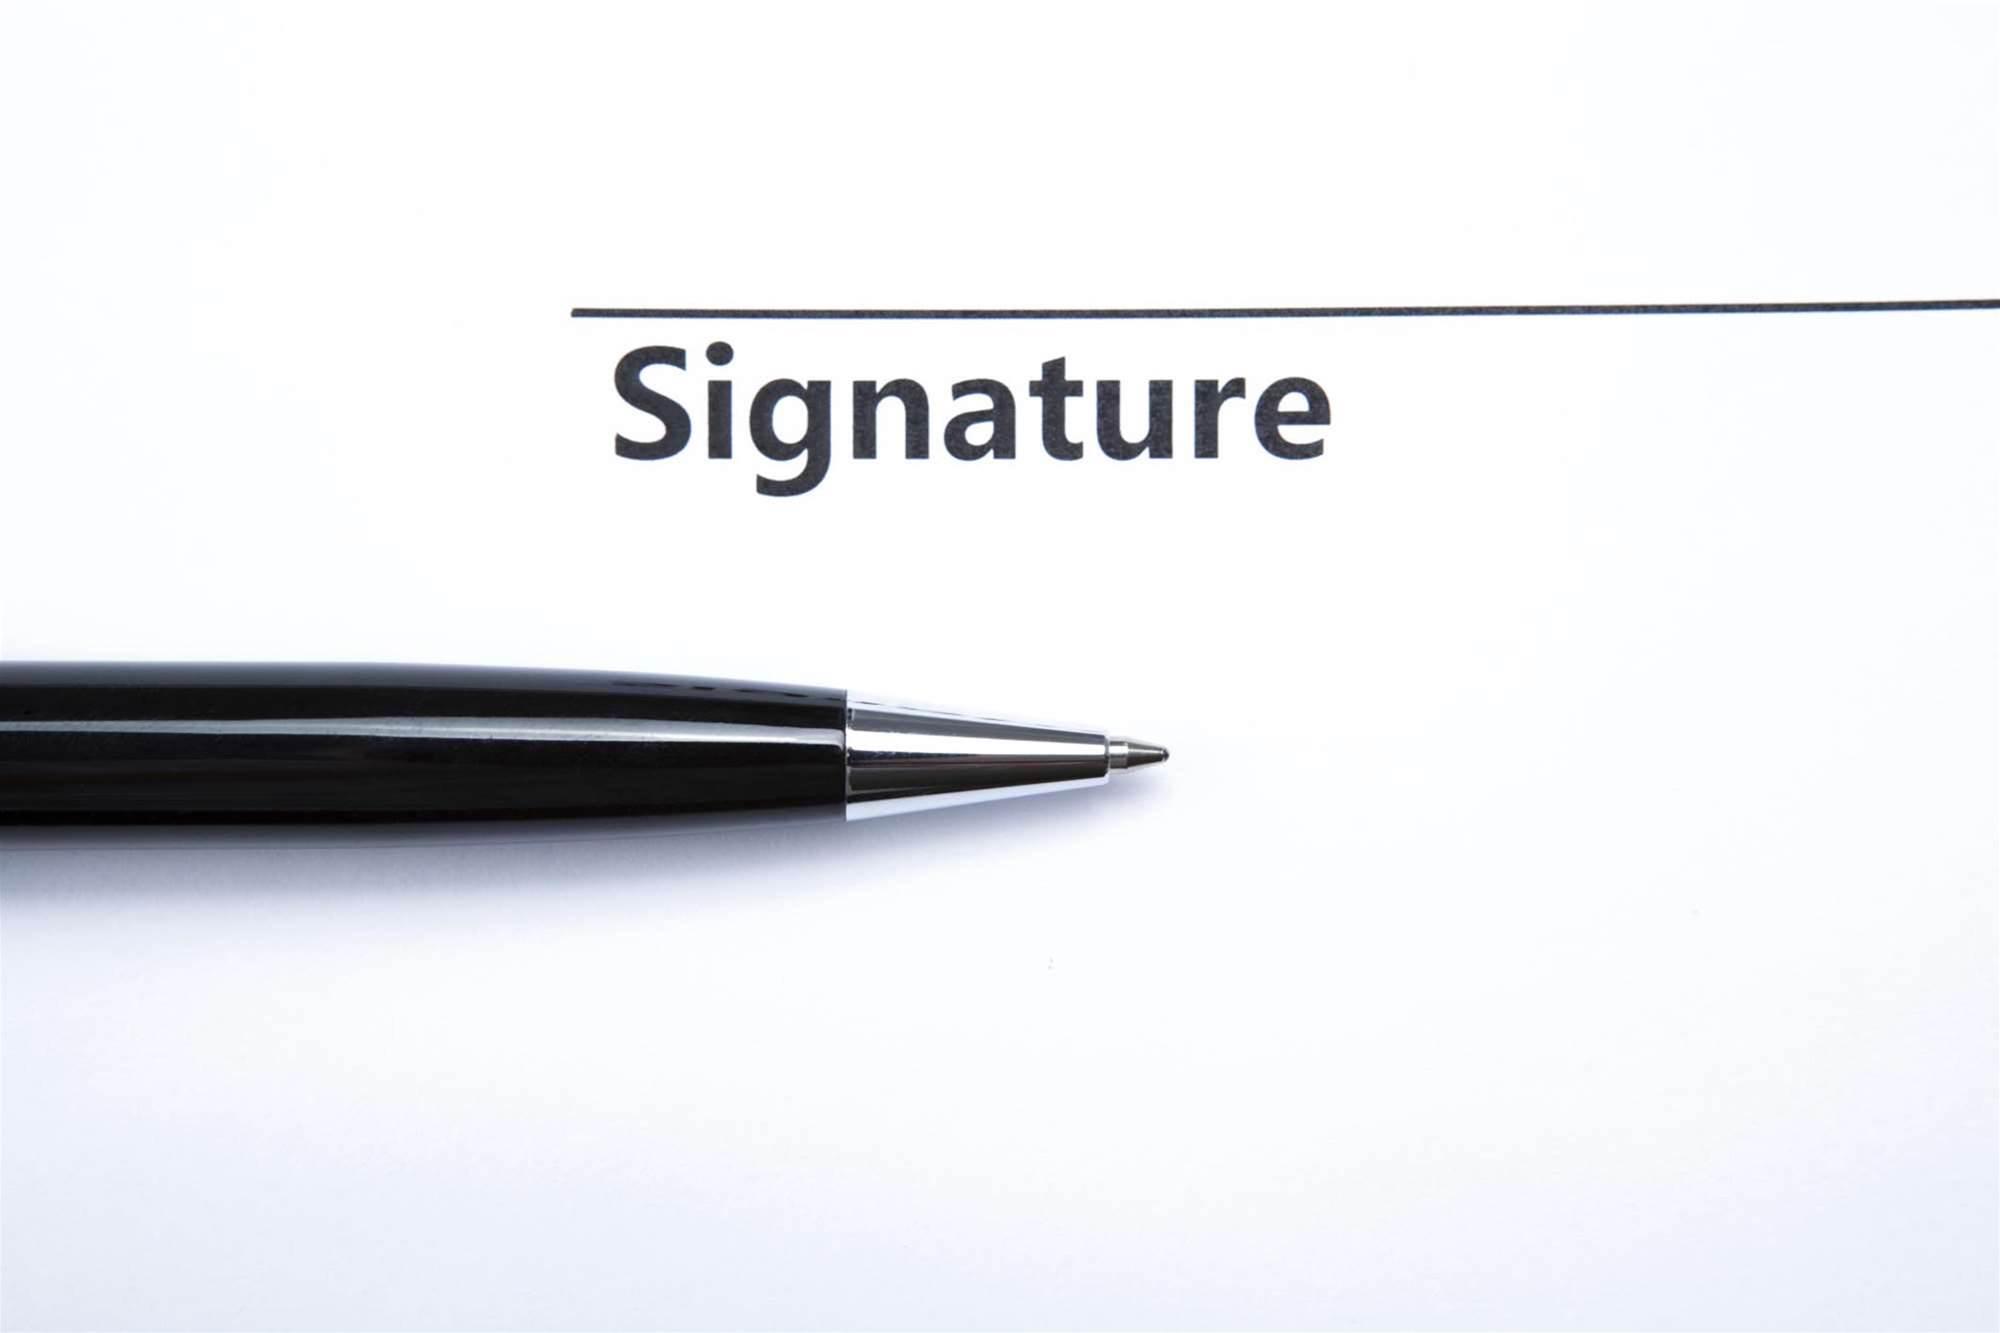 Inside the legalities of digital signatures